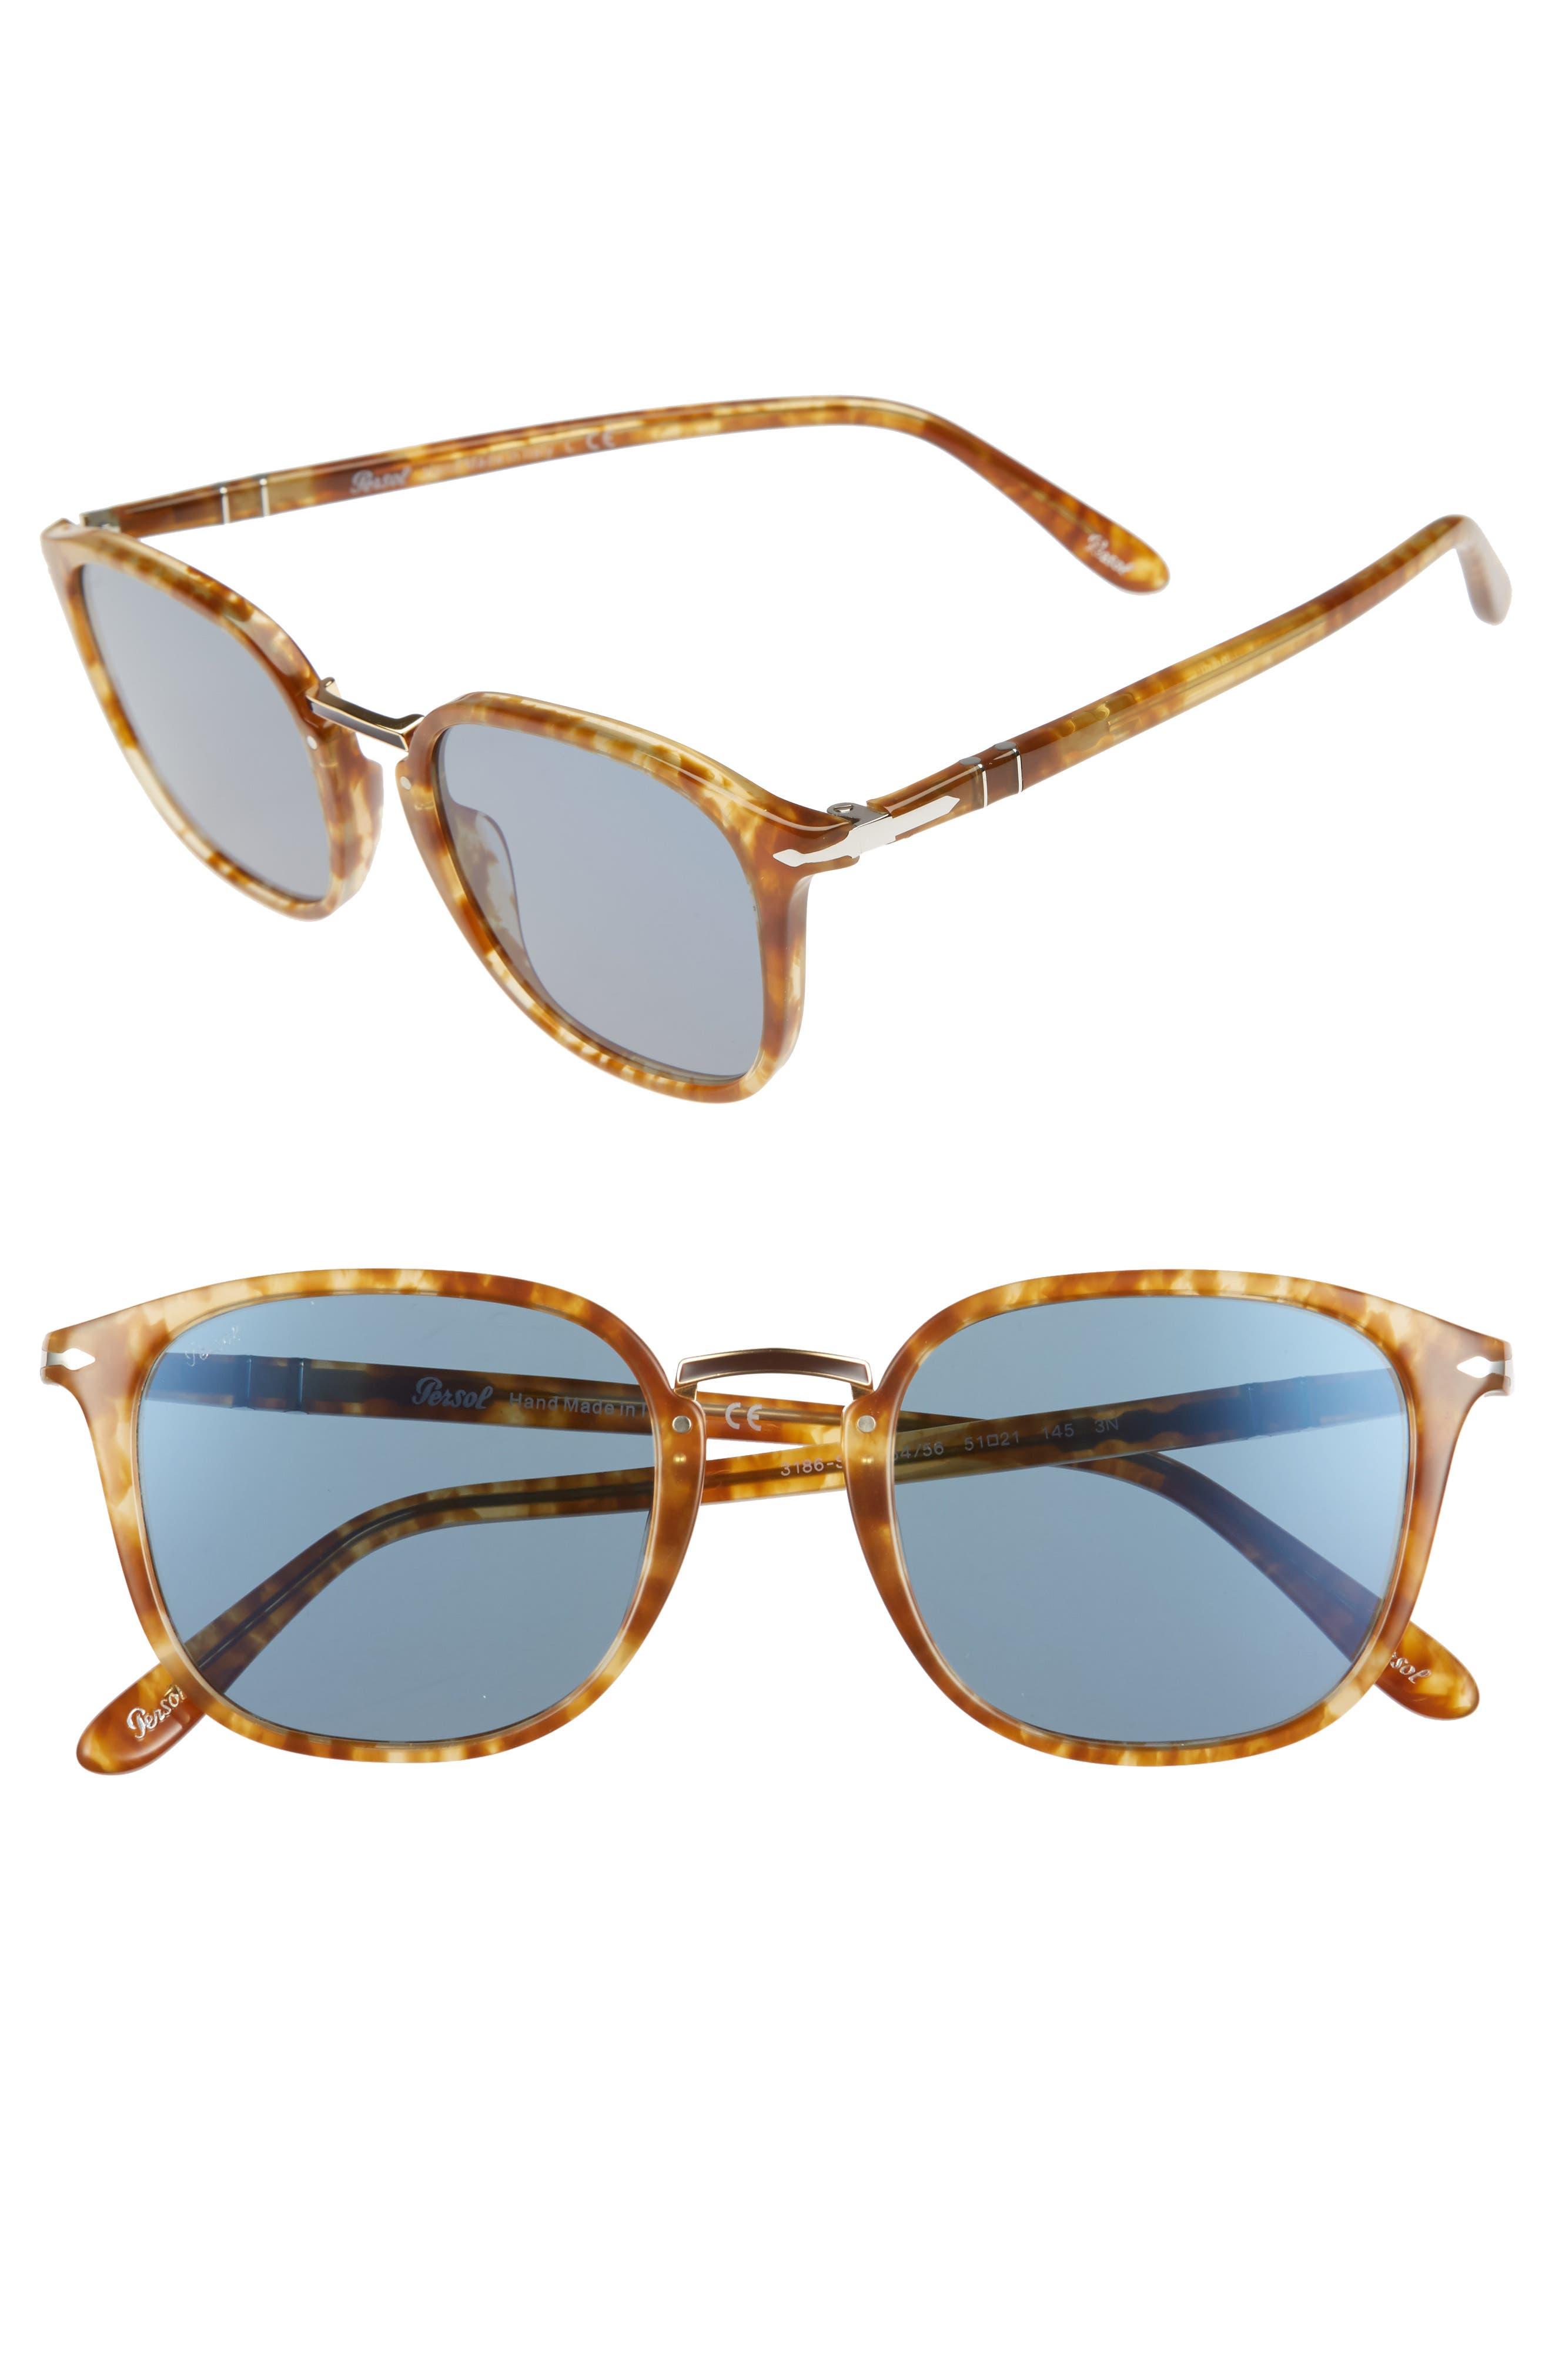 Phantos 51mm Crystal Lens Sunglasses,                             Main thumbnail 1, color,                             260